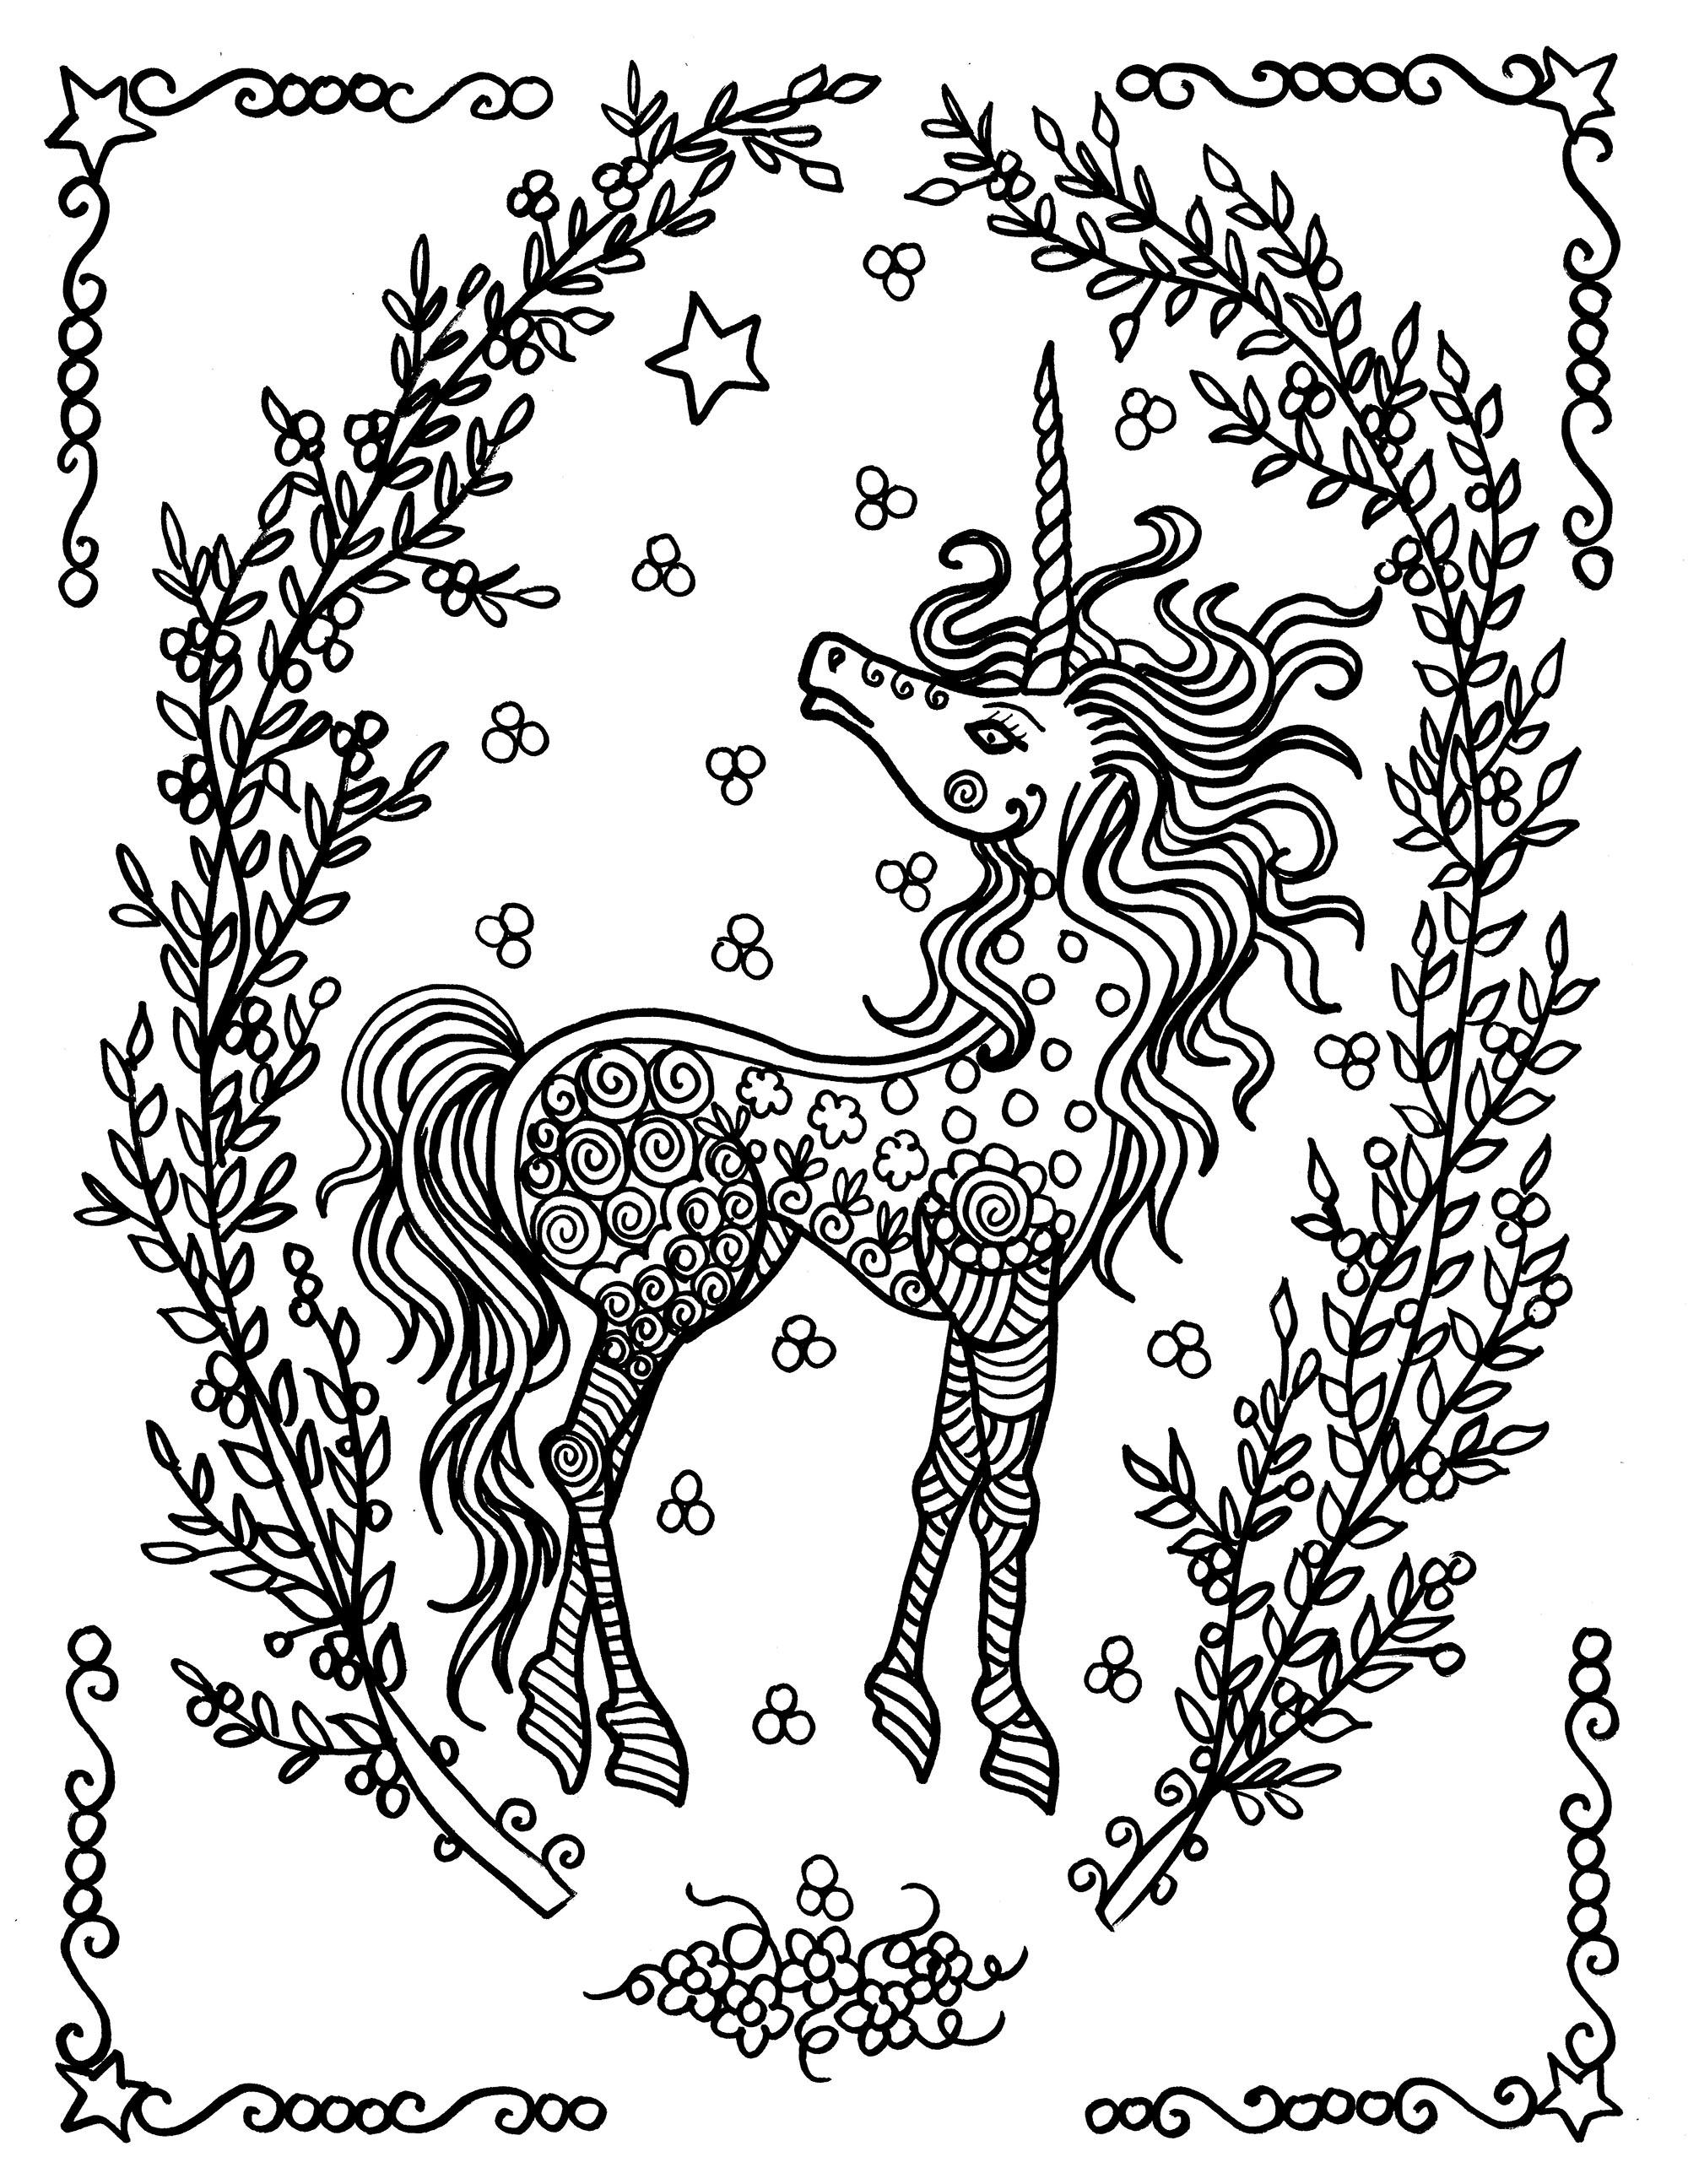 Colorear para adultos : Unicorni - 1